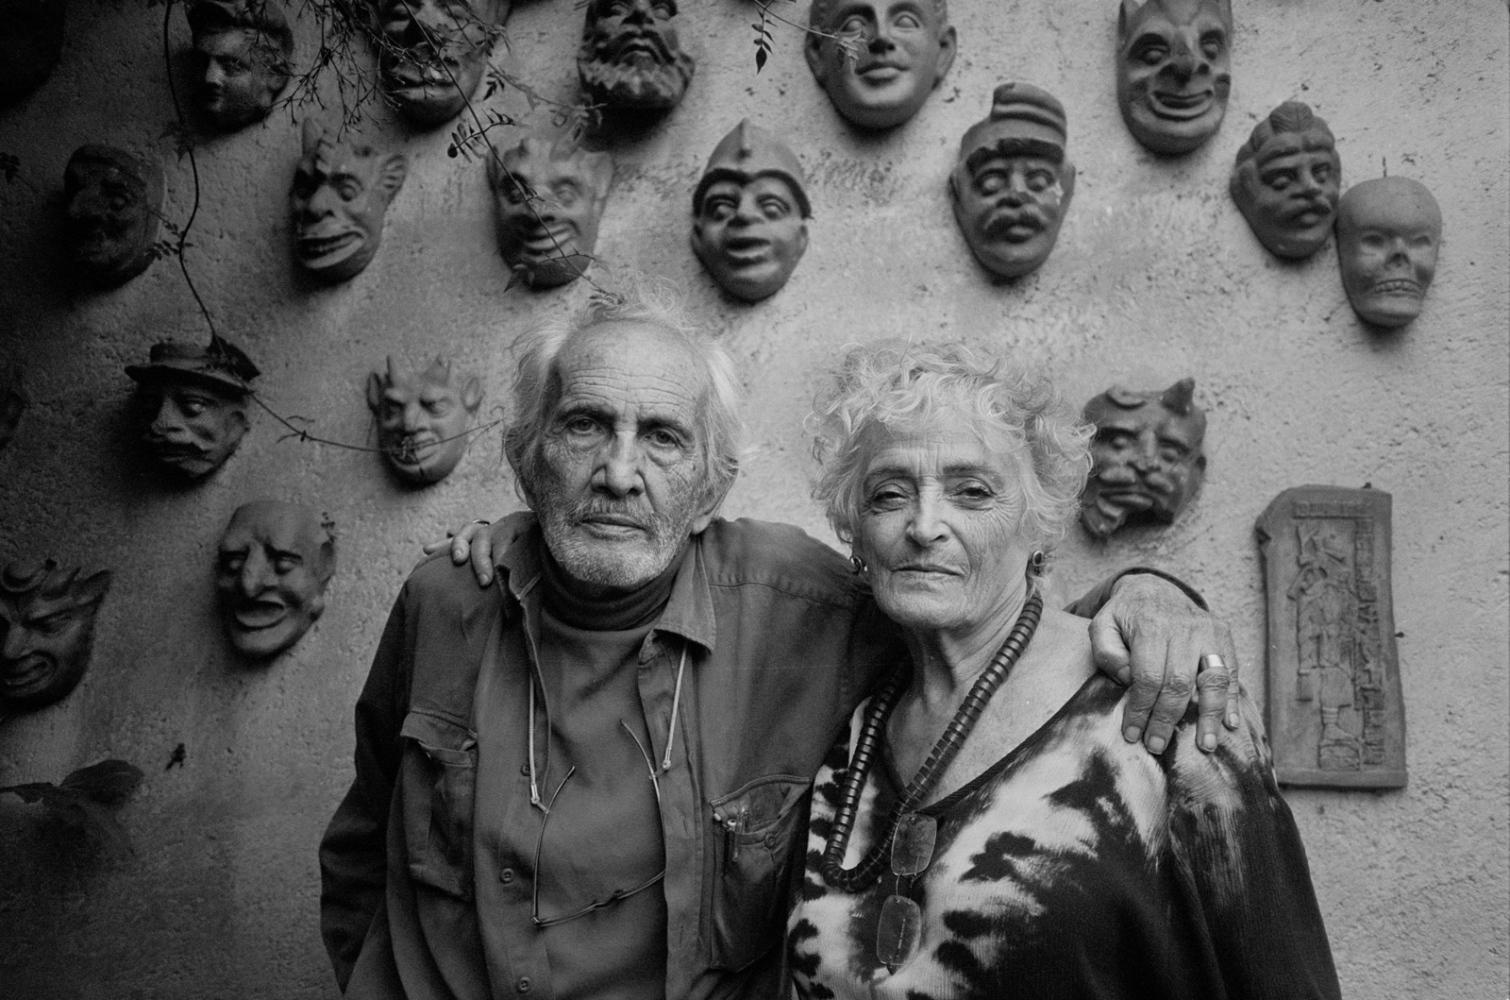 Hugo Velazquezand Aurora Suarez, artists, ceramists,old friends. Hugo was oneof the first people I met when I moved to Mexico, Cuernavaca , Morelos 2010 ©Sylvia de Swaan